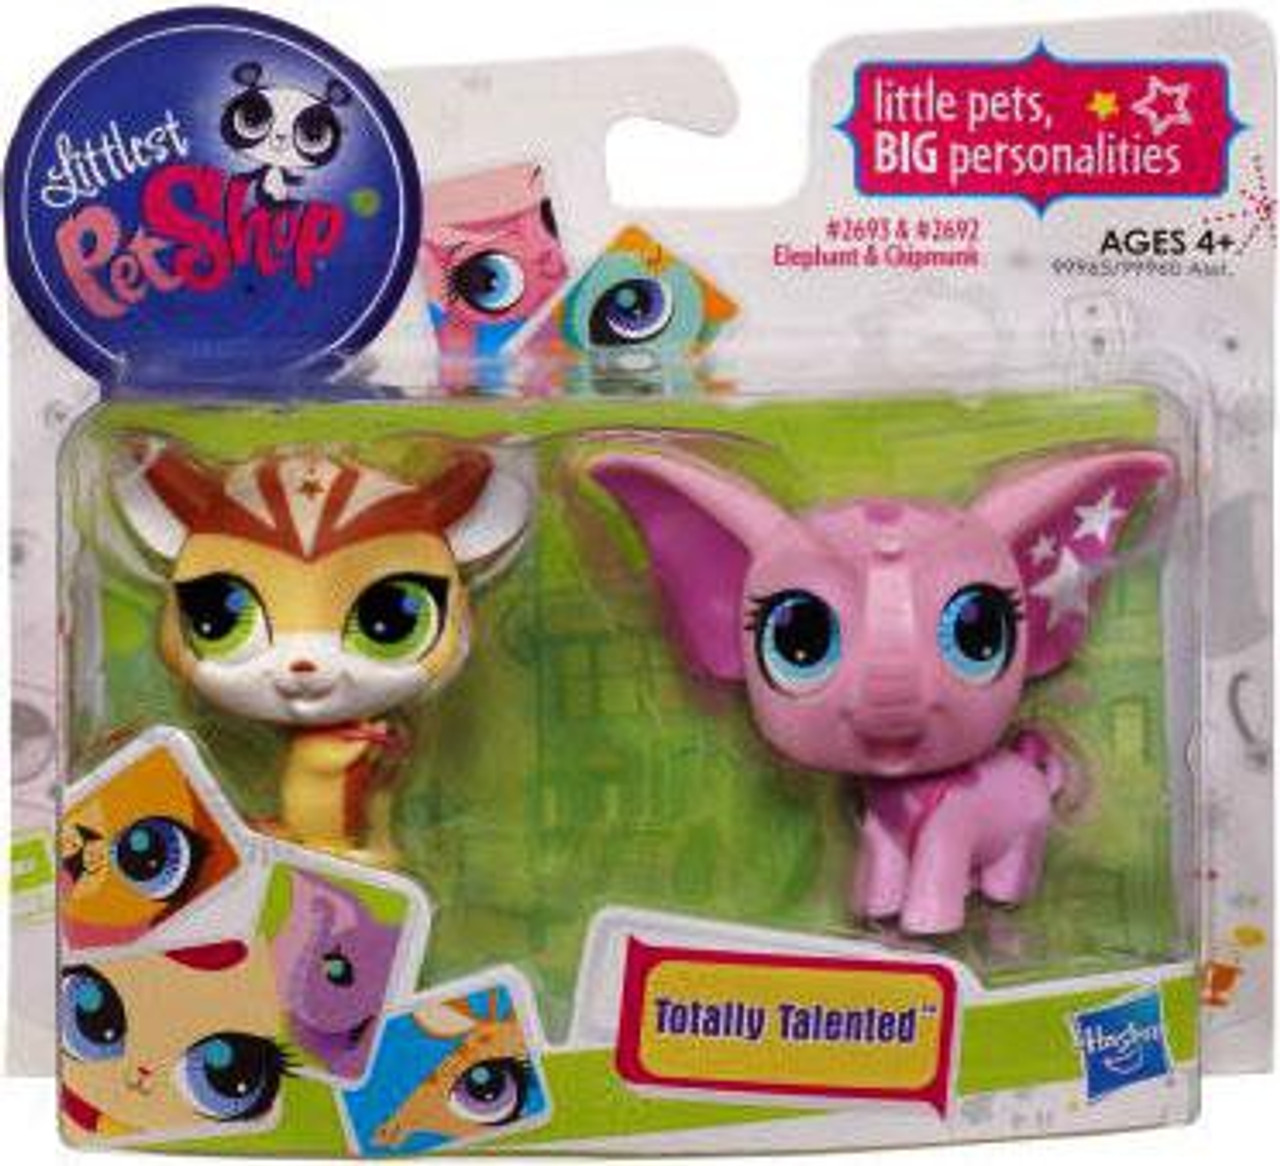 Littlest Pet Shop Totally Talented Pets Chipmunk & Elephant Figure 2-Pack #2693, 2692